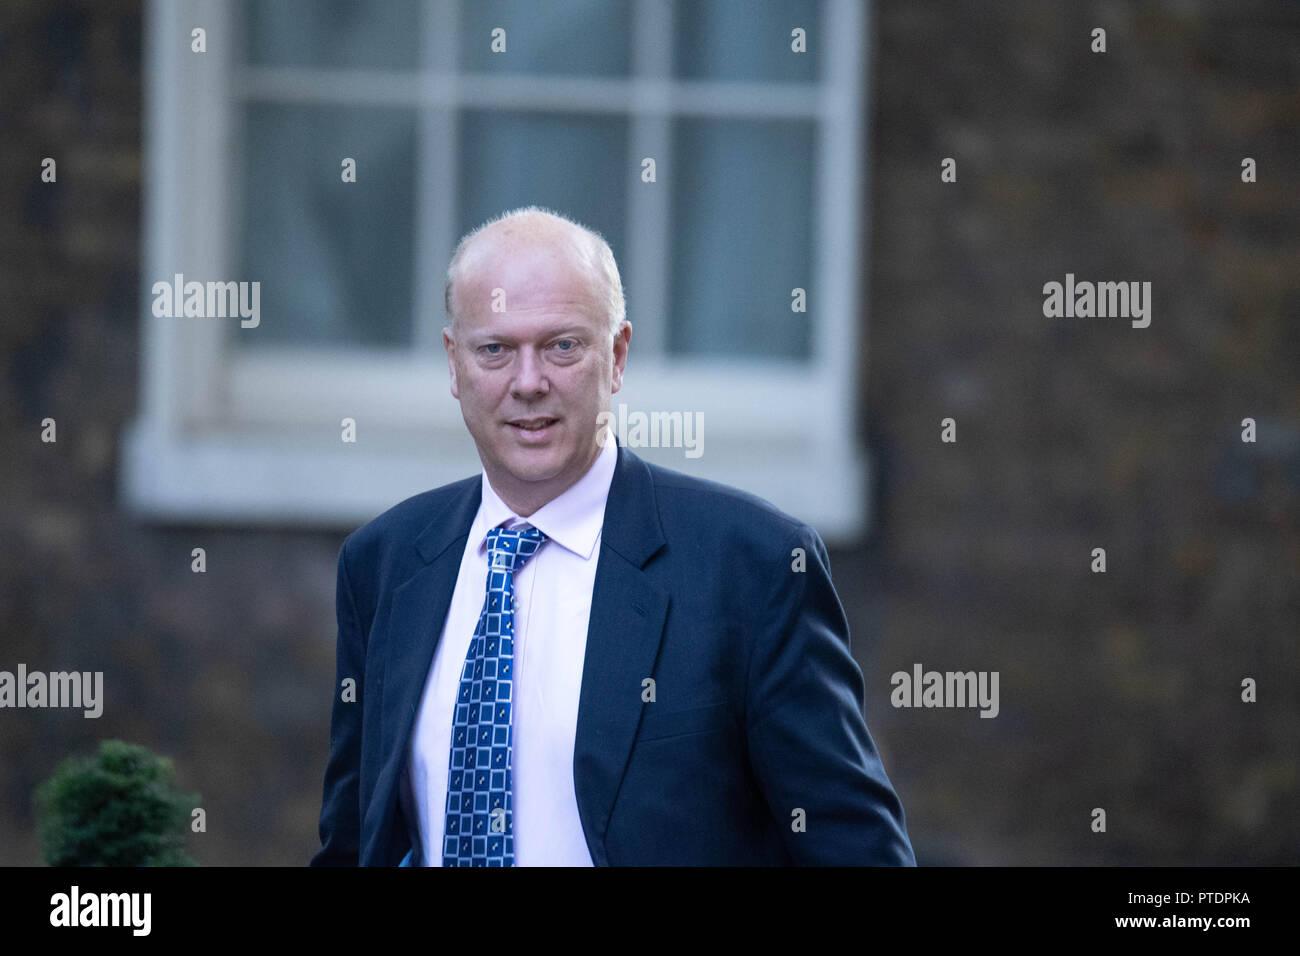 London 9th October 2018, Chris Grayling MP PC, Transport Secretary,, arrives at a  Cabinet meeting at 10 Downing Street, London Credit Ian Davidson/Alamy Live News - Stock Image